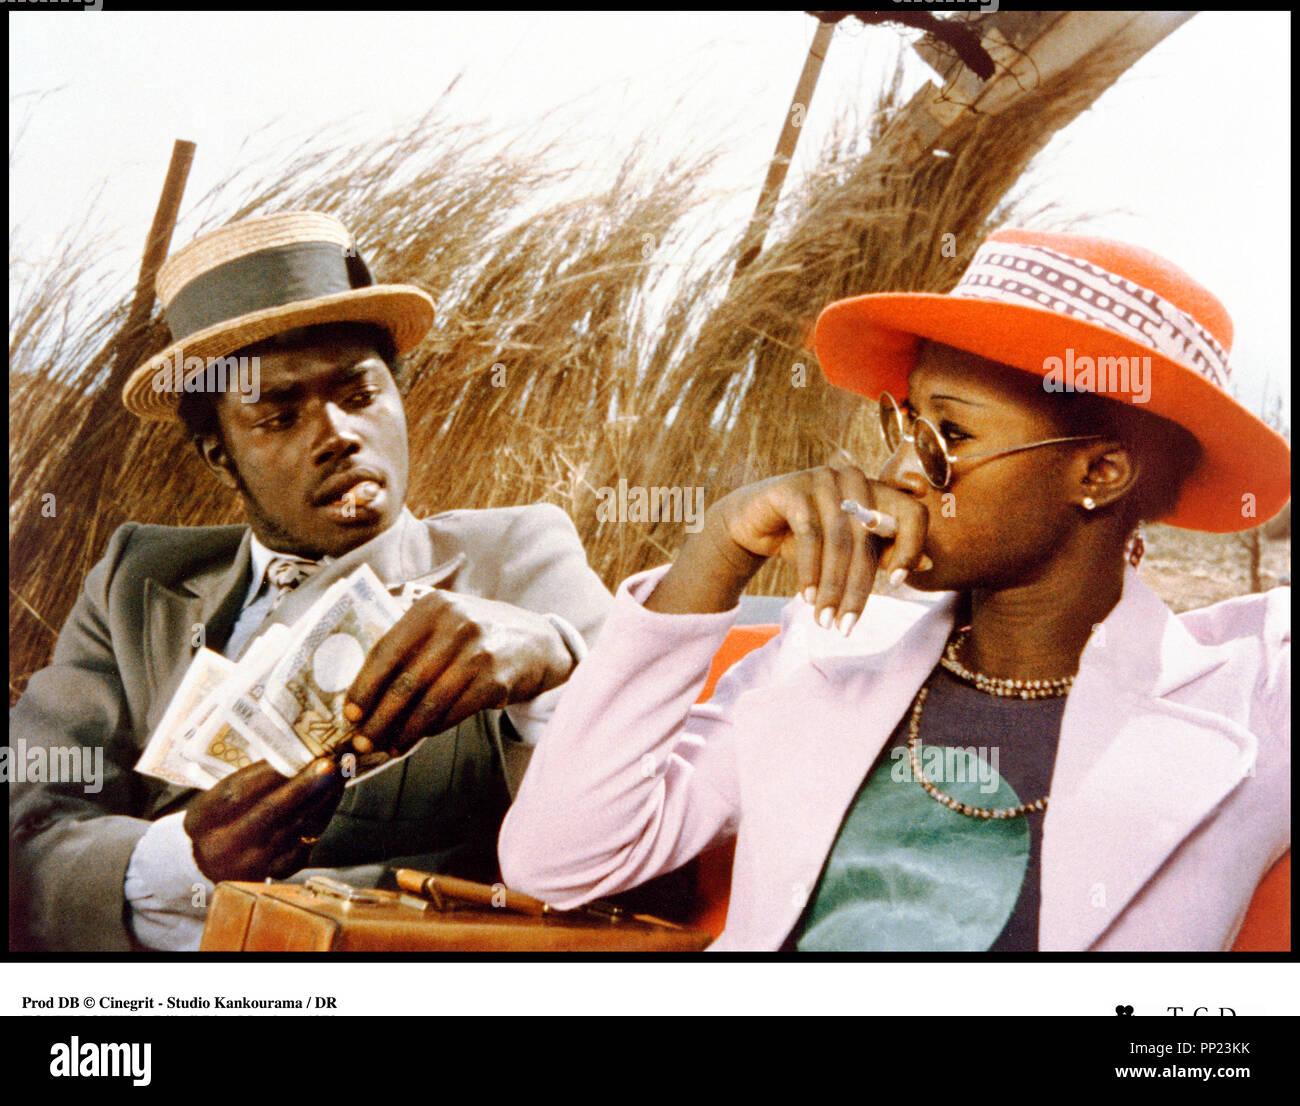 Prod DB © Cinegrit - Studio Kankourama / DR TOUKI-BOUKI (TOUKI BOUKI) de Djibril Diop Mambety 1973 SENEGAL avec Magaye Niang et Mareme Niang frime, billets de banque, fume cigarette, canotier autre titre: Le Voyage de la hyene, Journey of the HyenaStock Photo